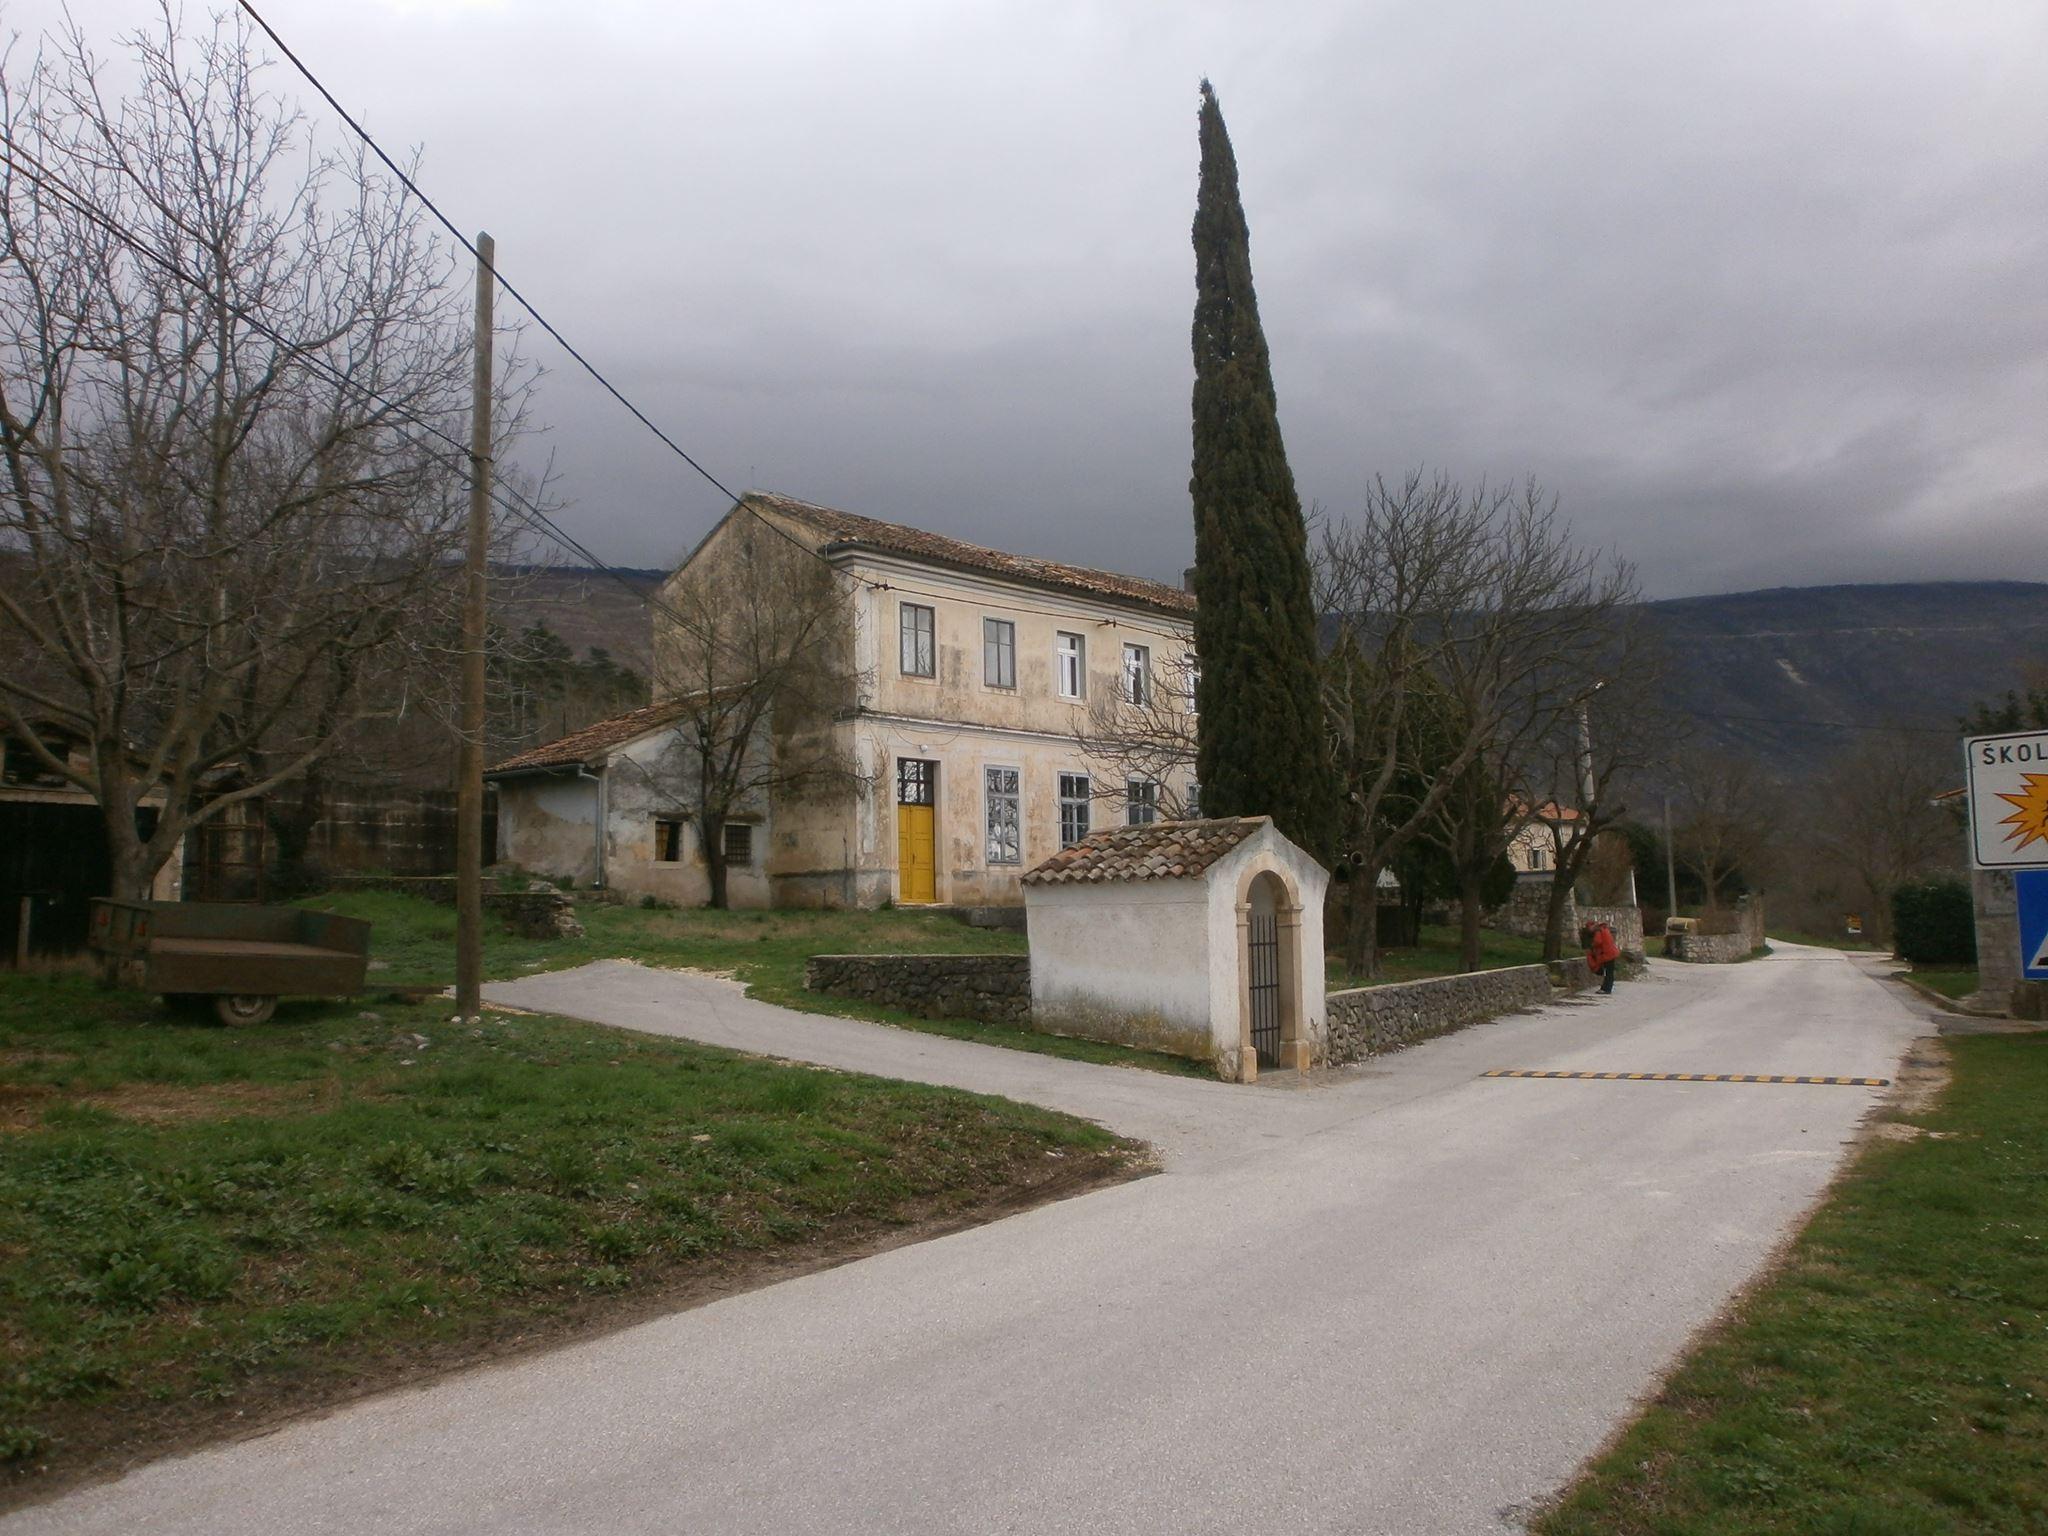 osnovna škola u Šušnjevici